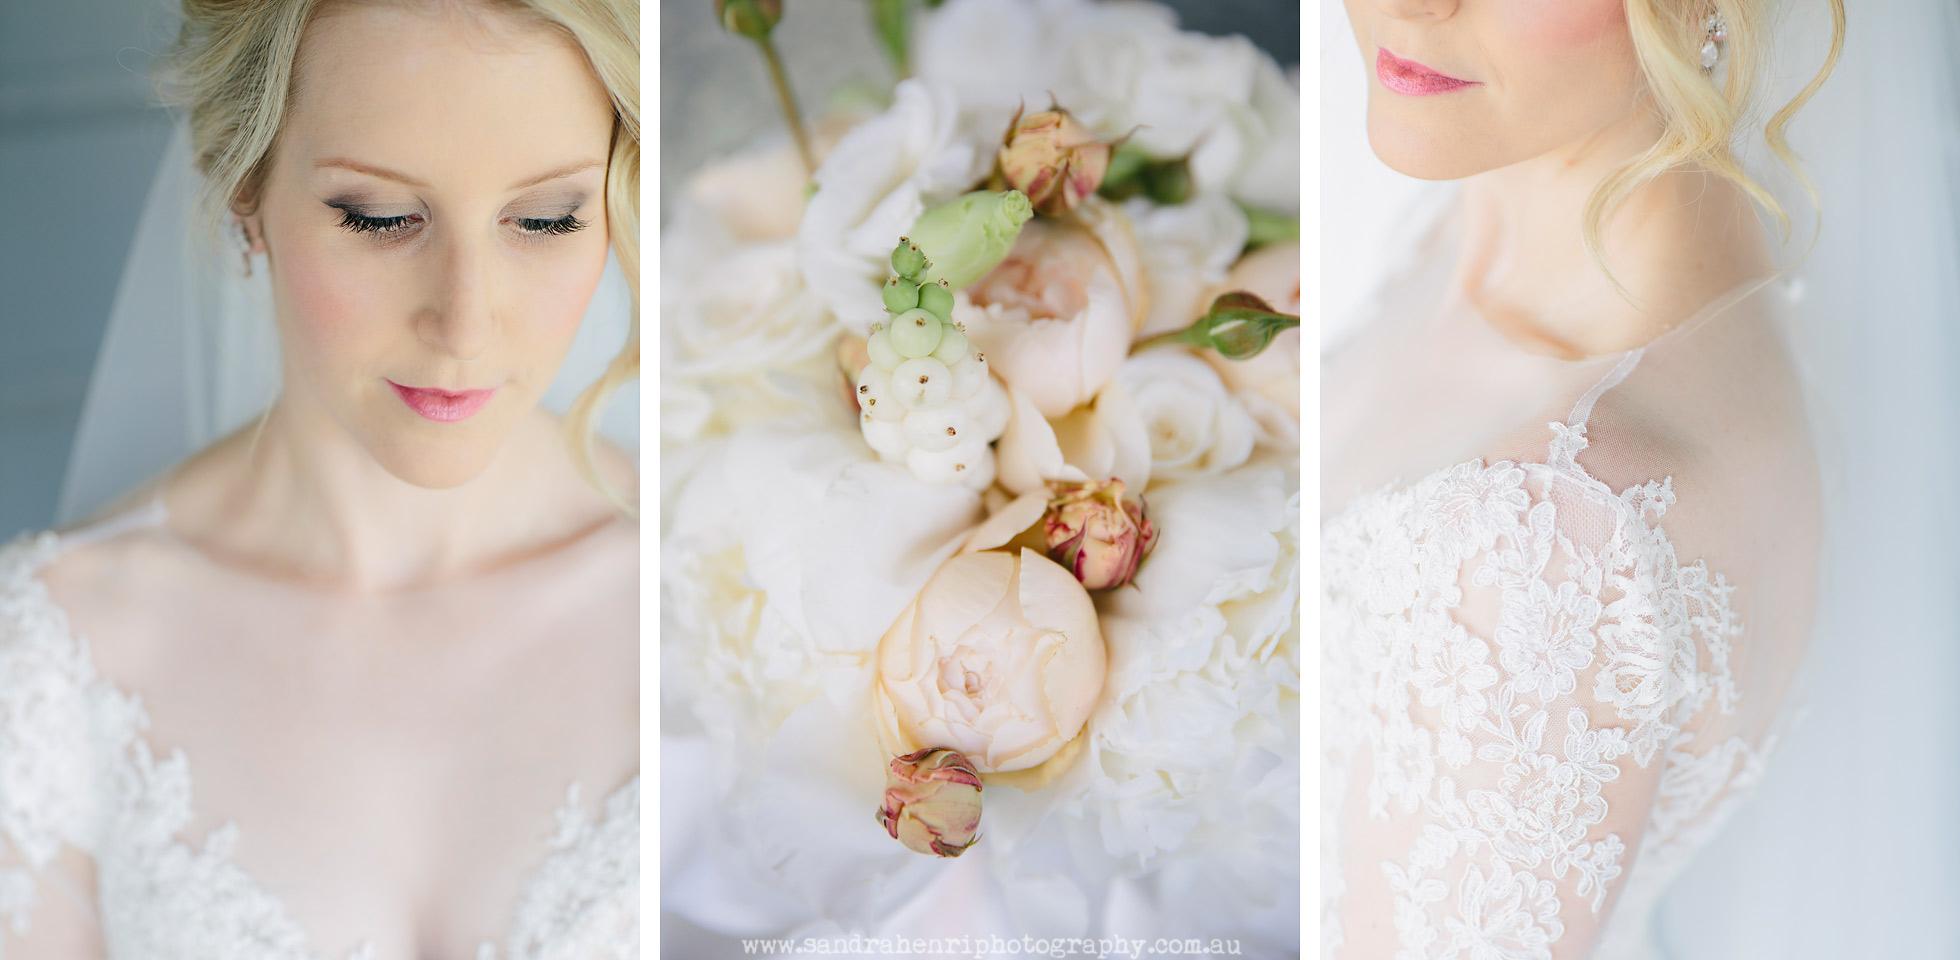 Roberts-Restaurant-garden-wedding-images-12.jpg